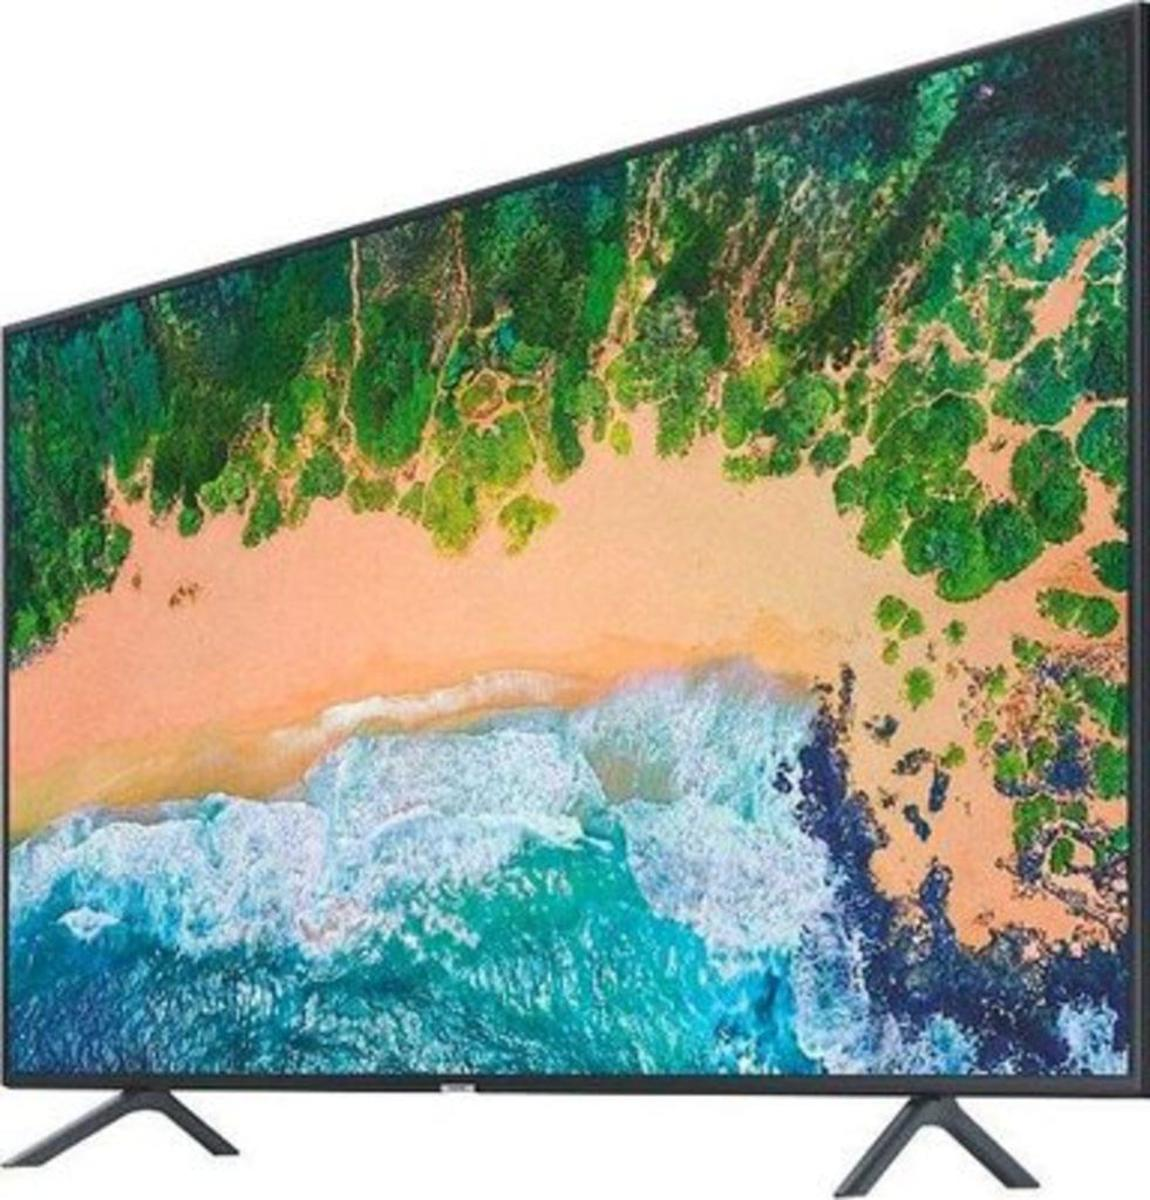 Bild 2 von Samsung UE43NU7199 UXZG LED-TV 43